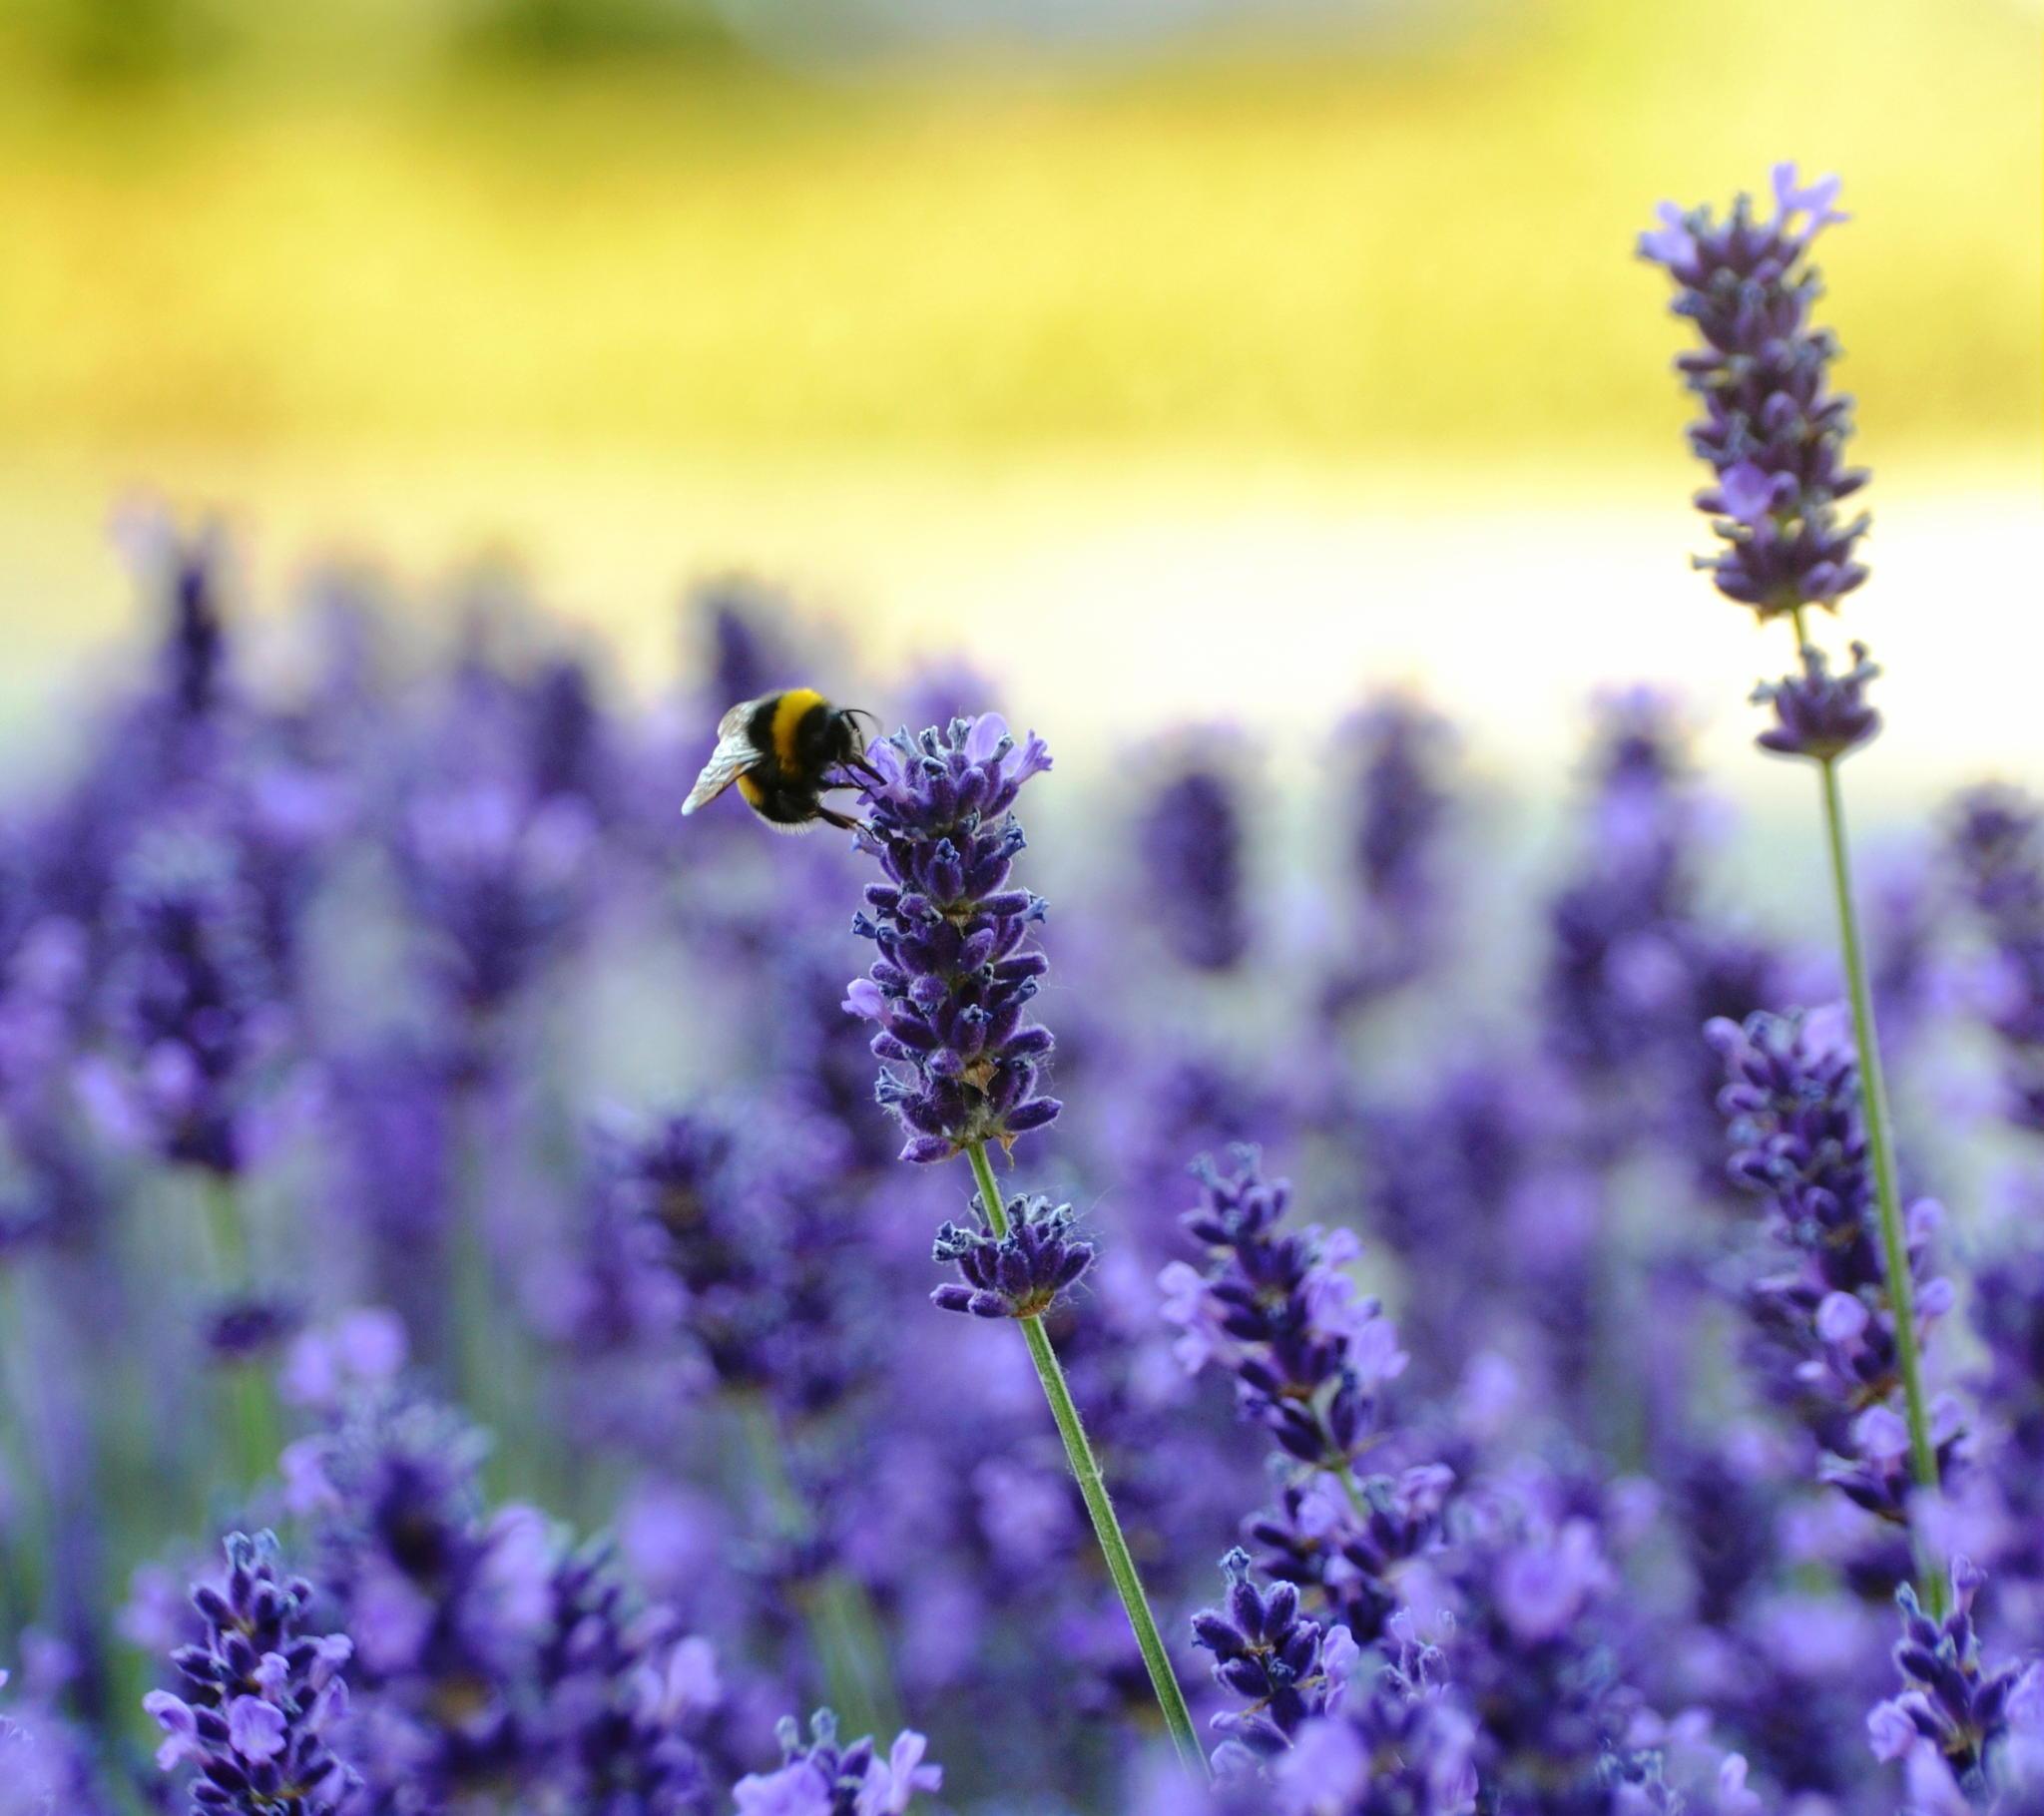 Фото Пчела сидит на цветке, ву Andrea Boldizsar